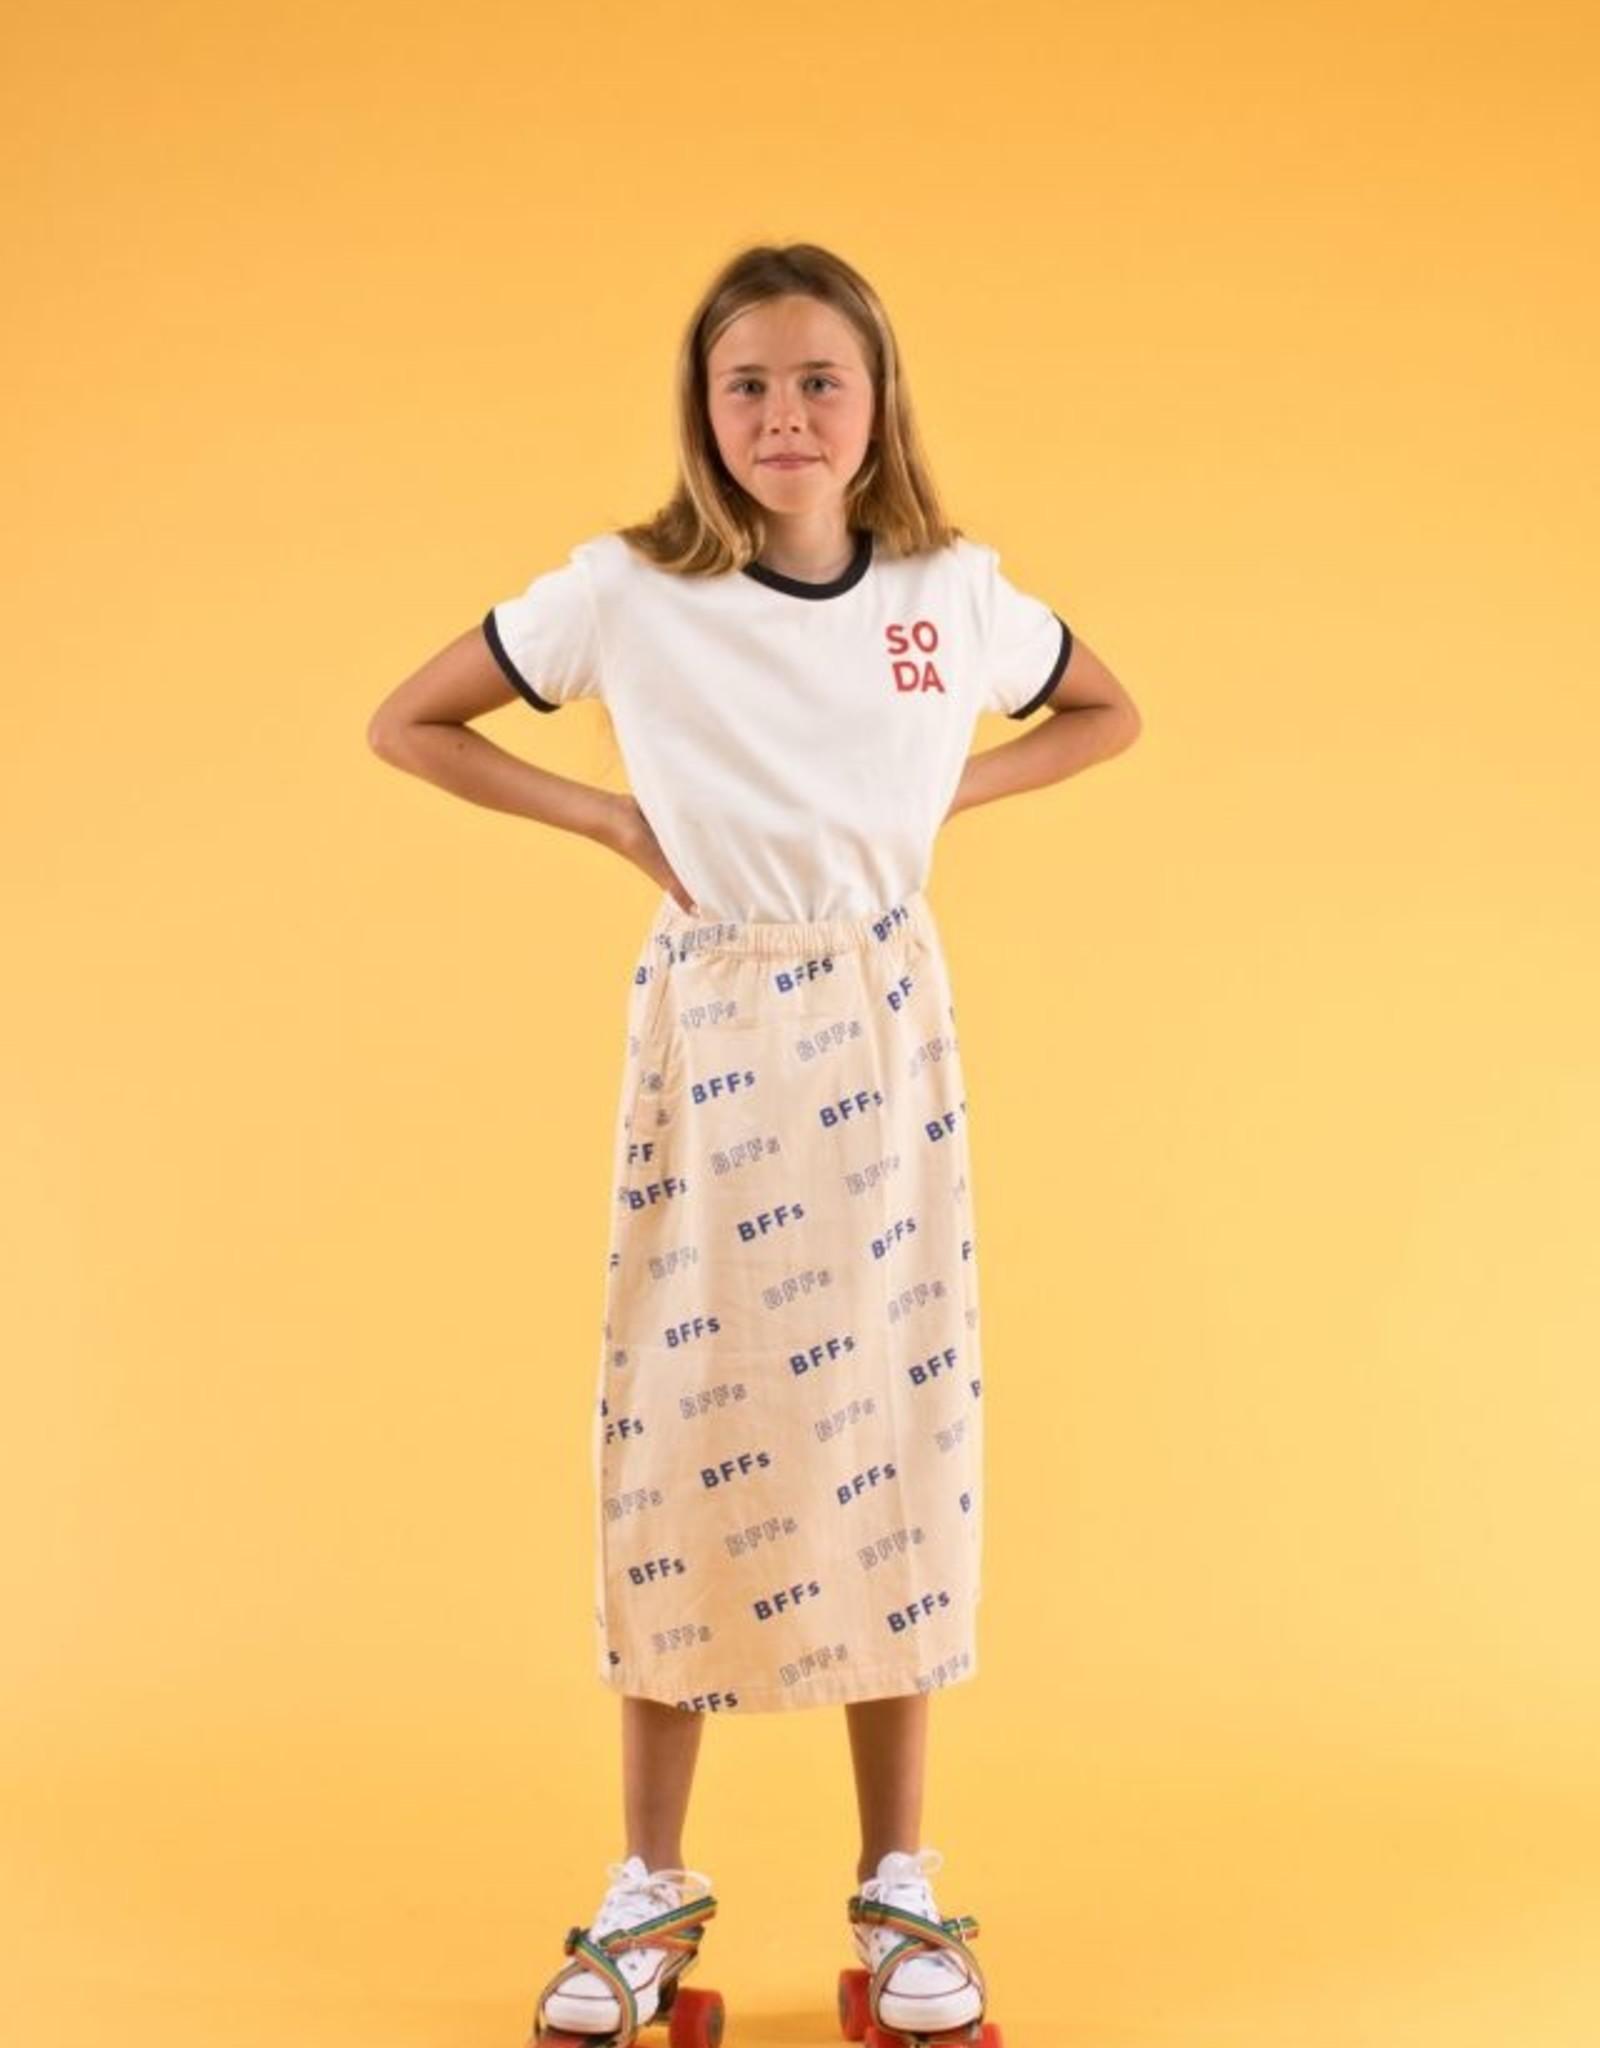 BFFS skirt